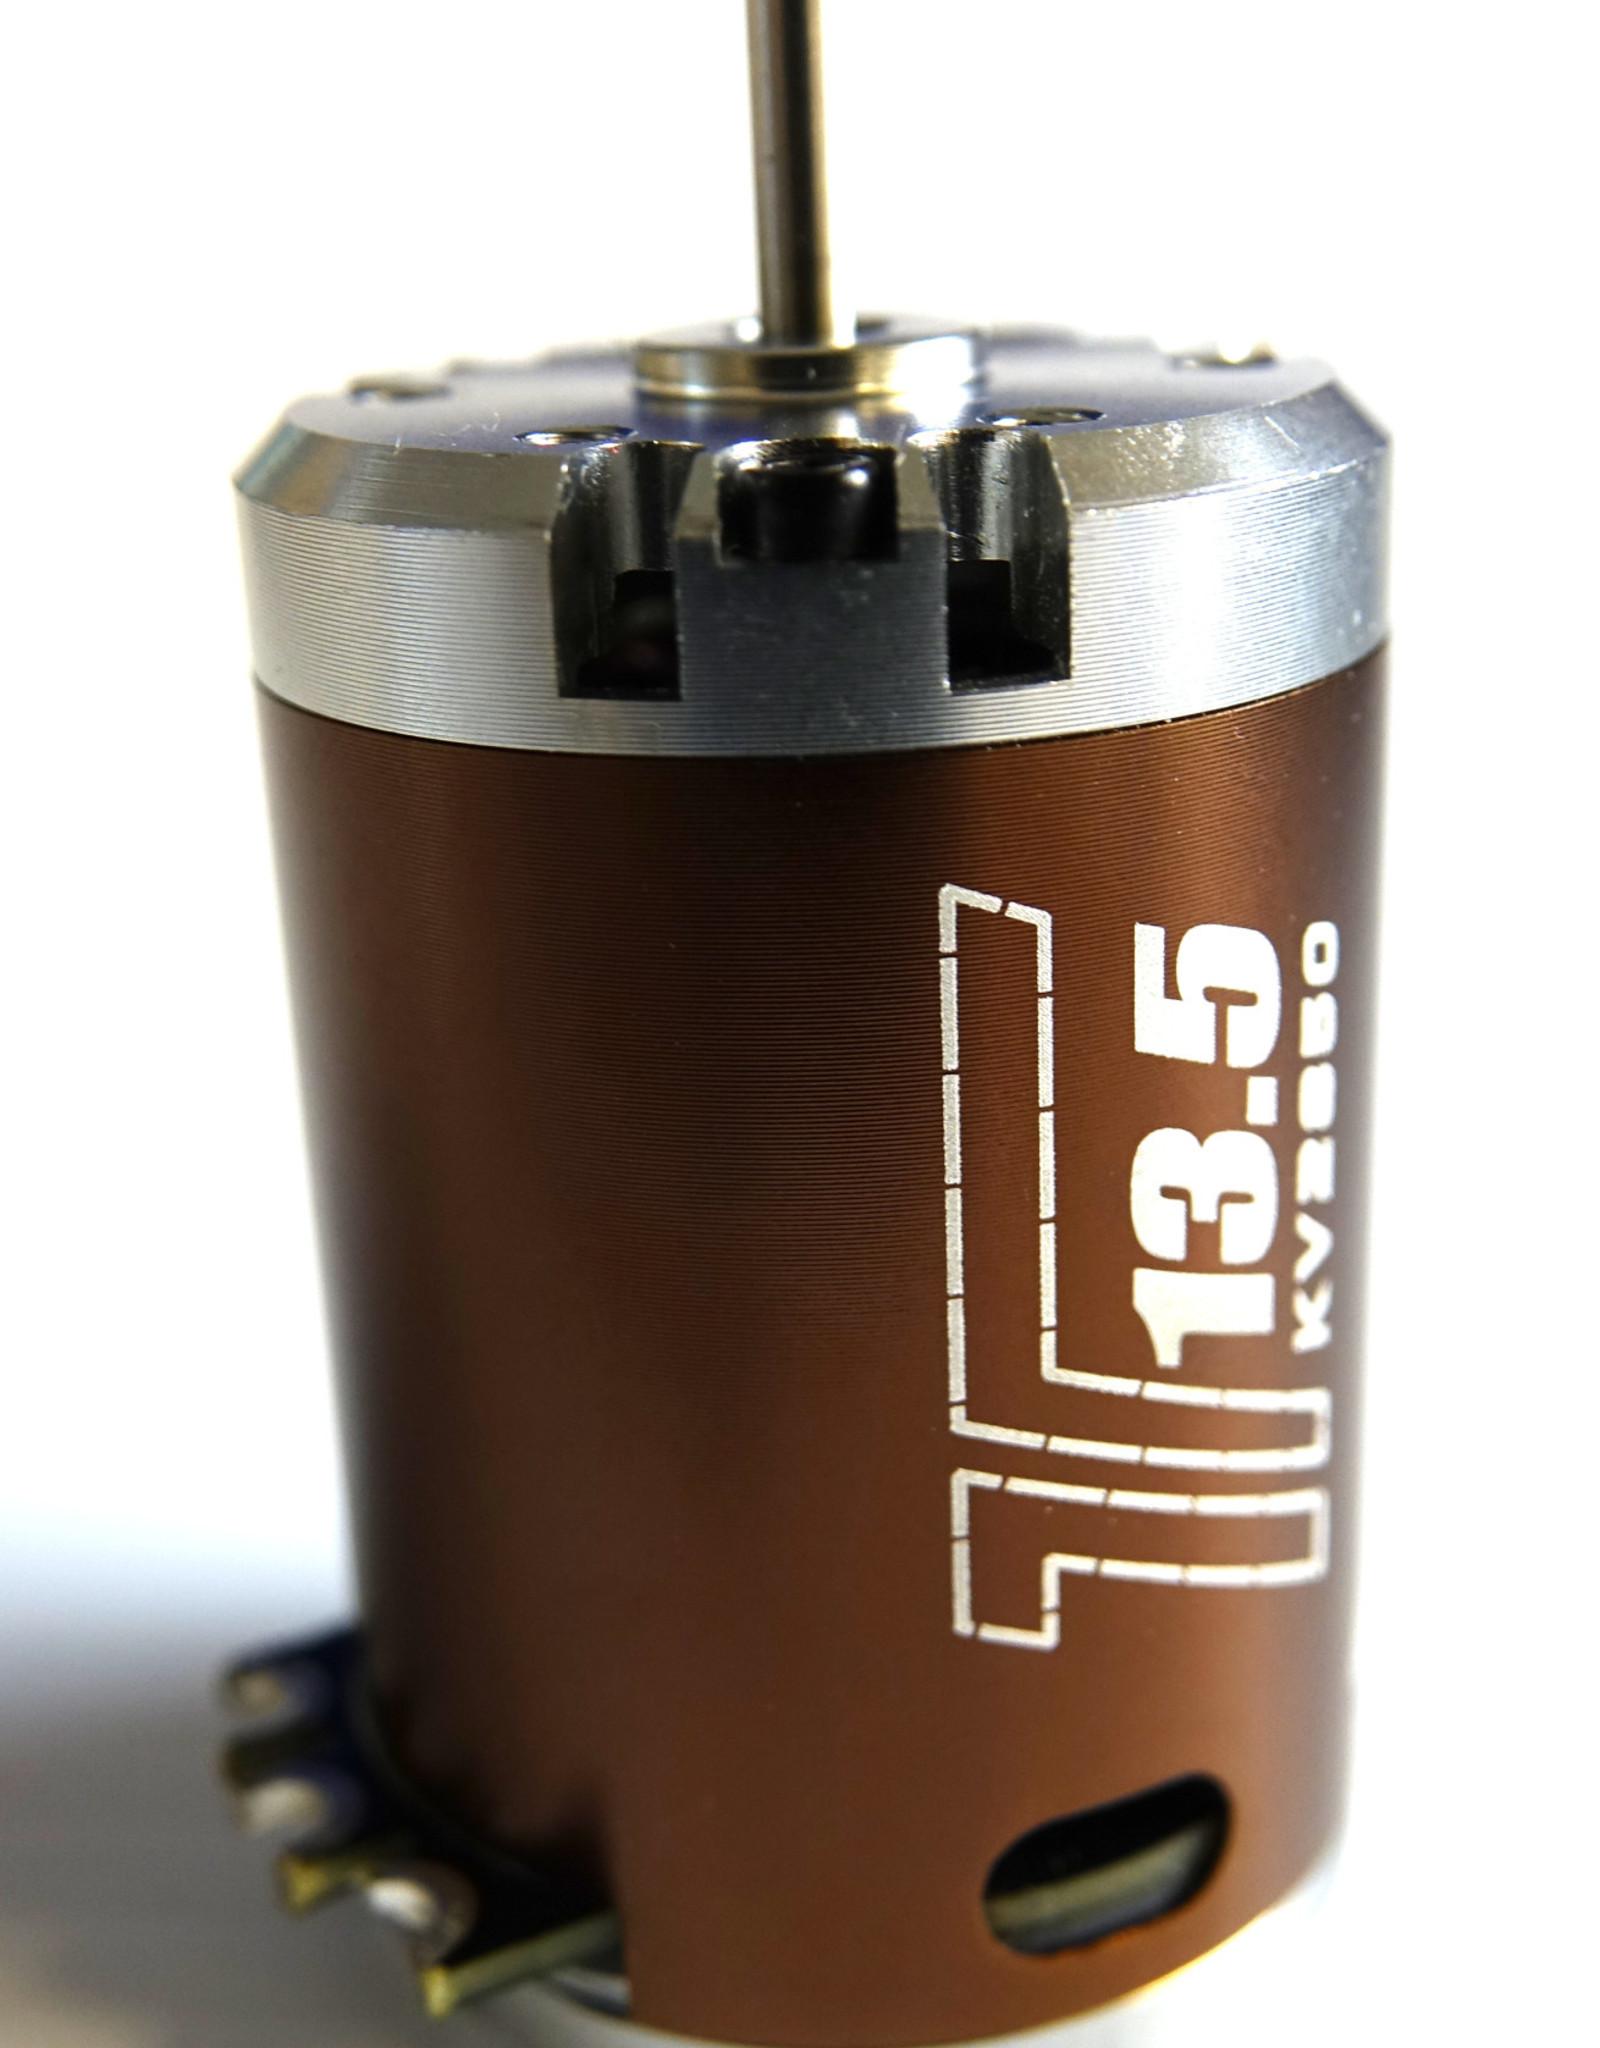 OmG OMGMBS005 13.5T Brushless Sensored Motor by OMG